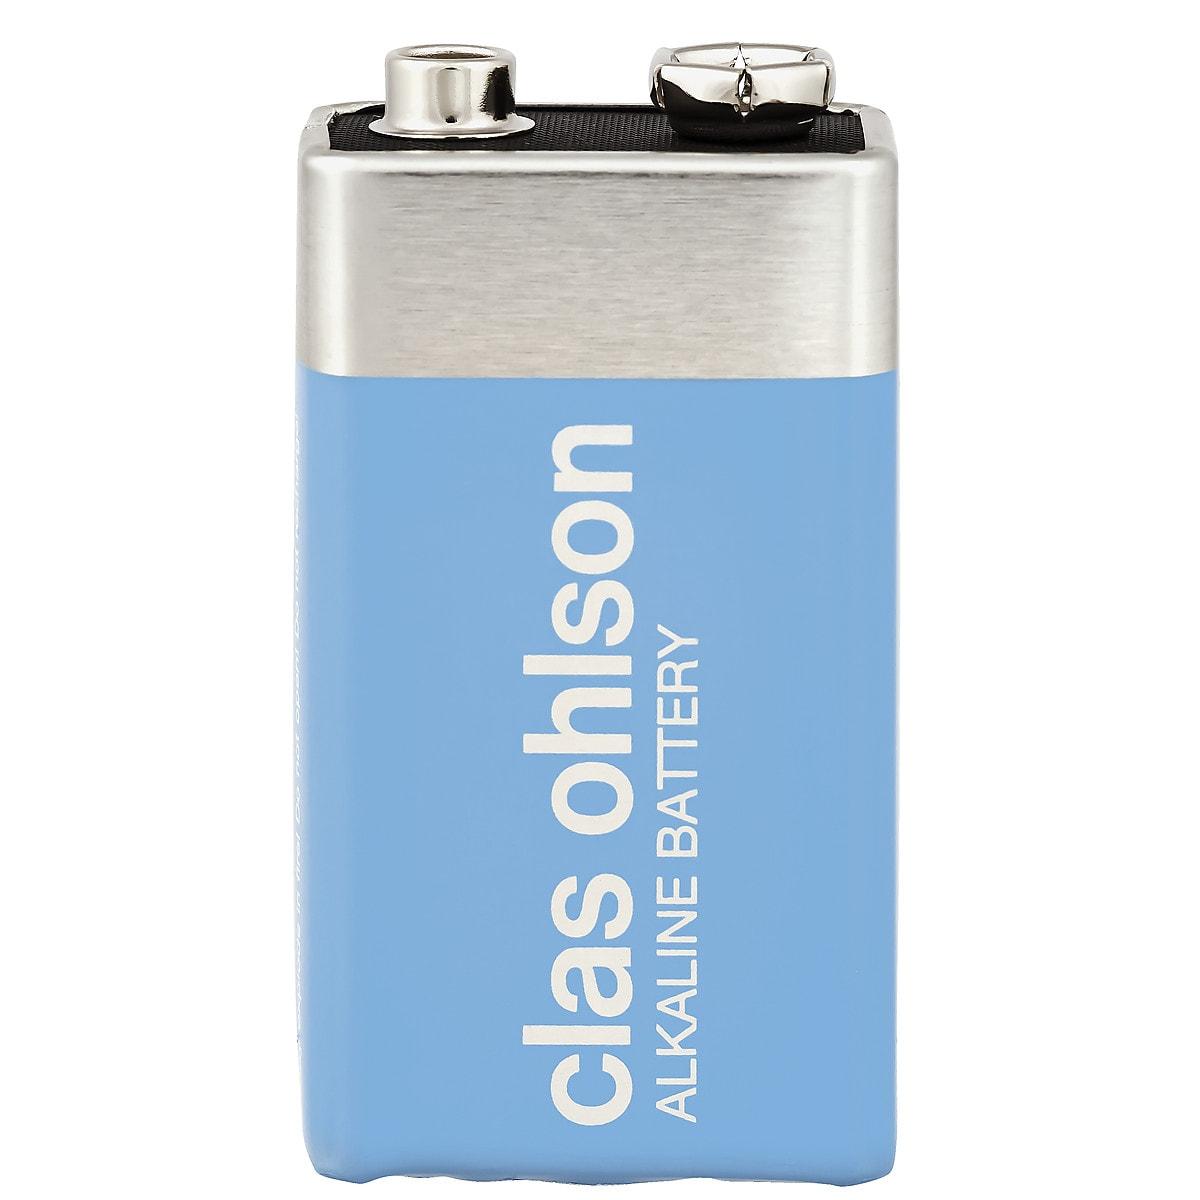 Alkaliparisto 9 V Clas Ohlson